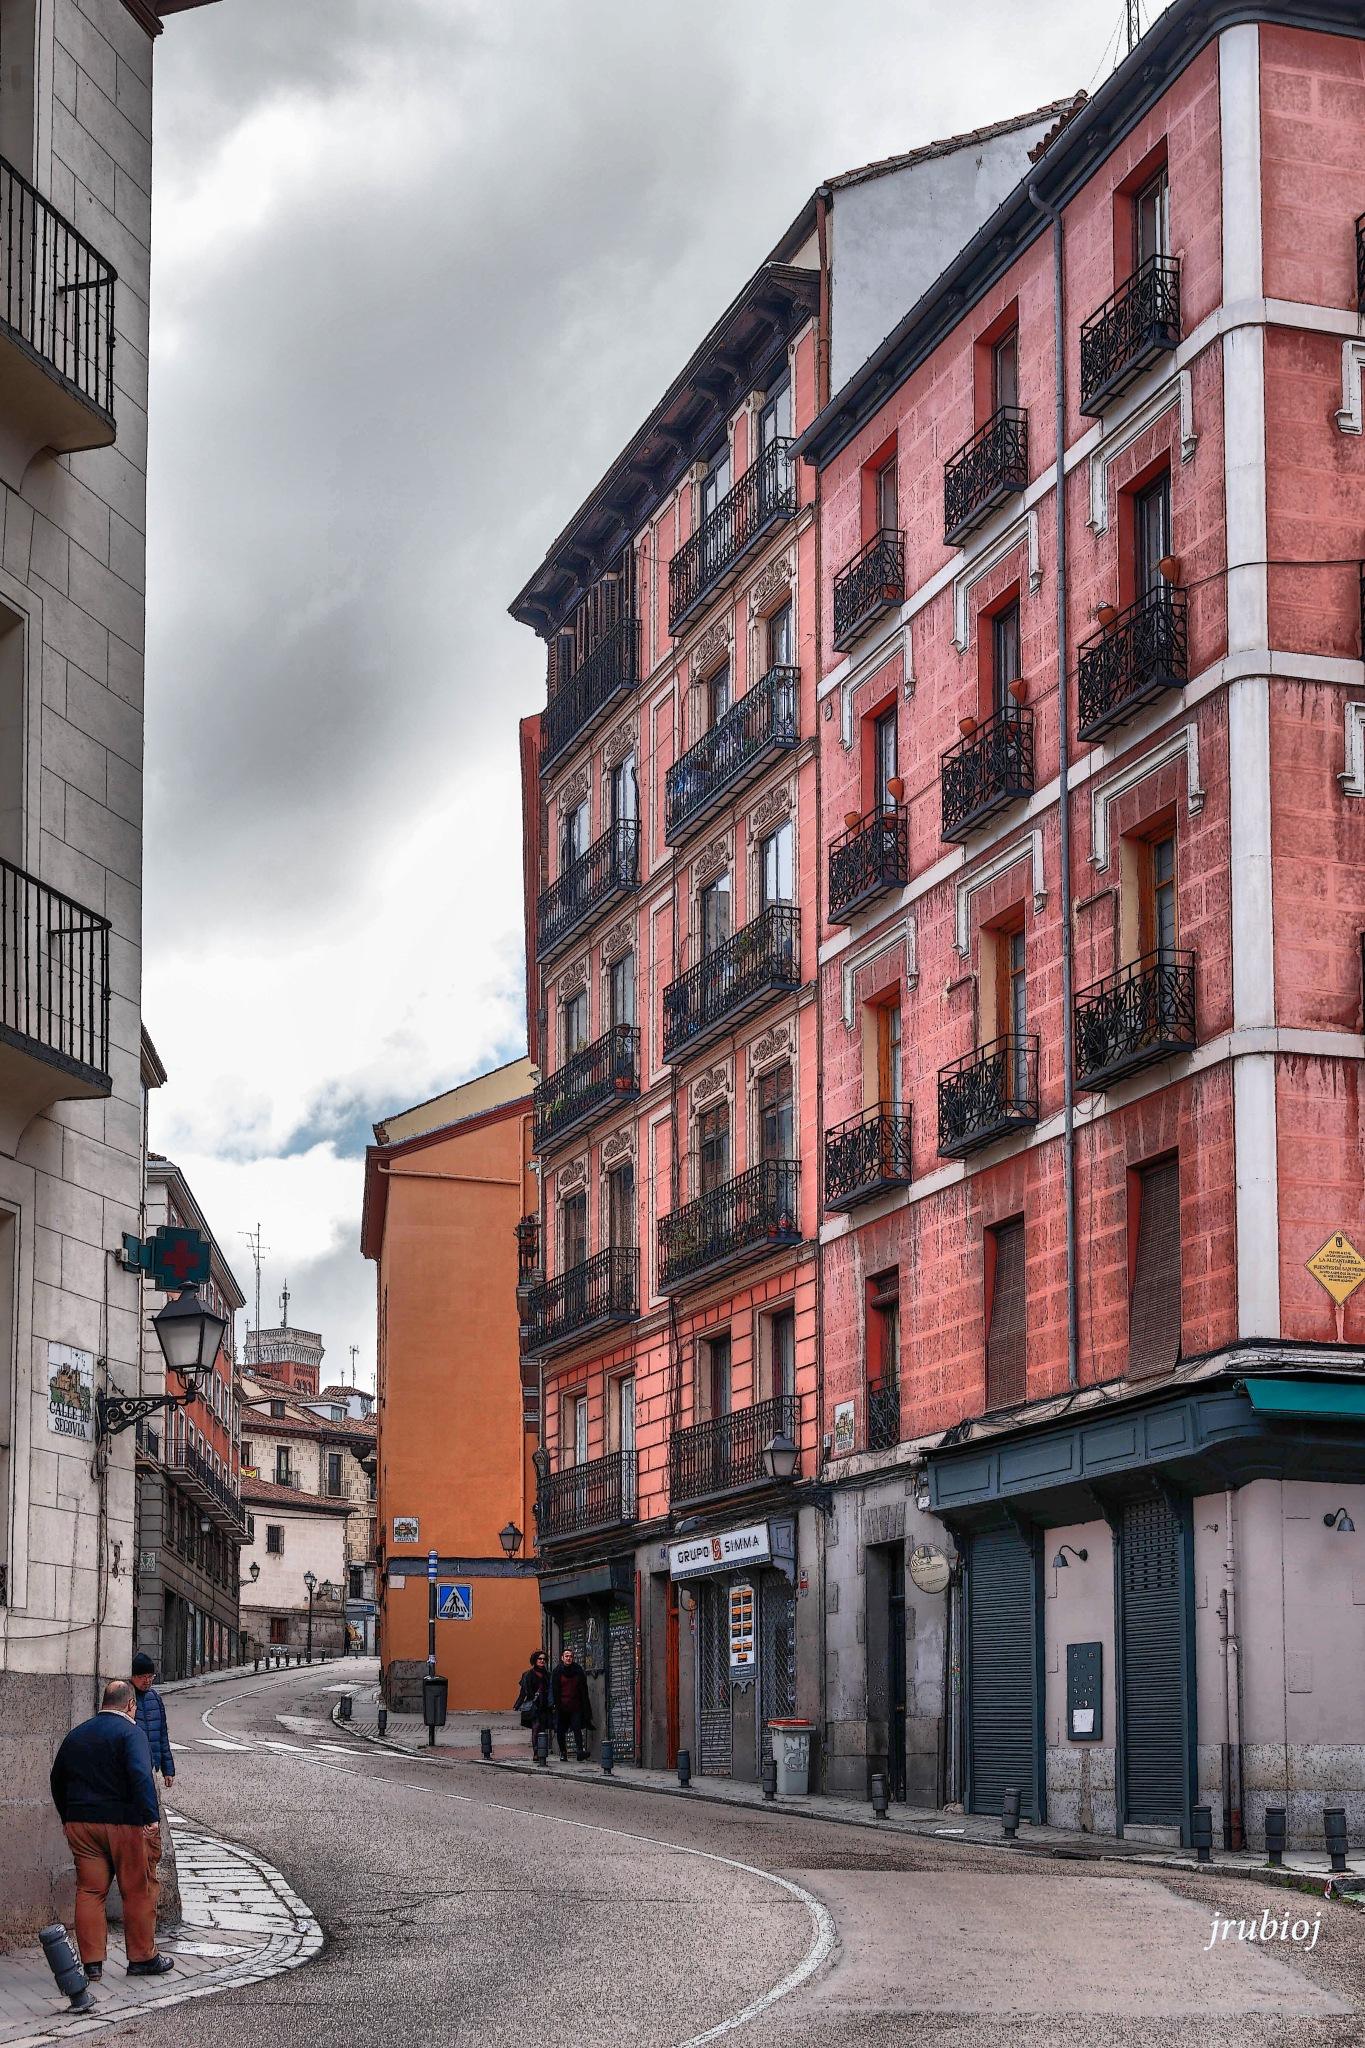 Madrid by julio rubio